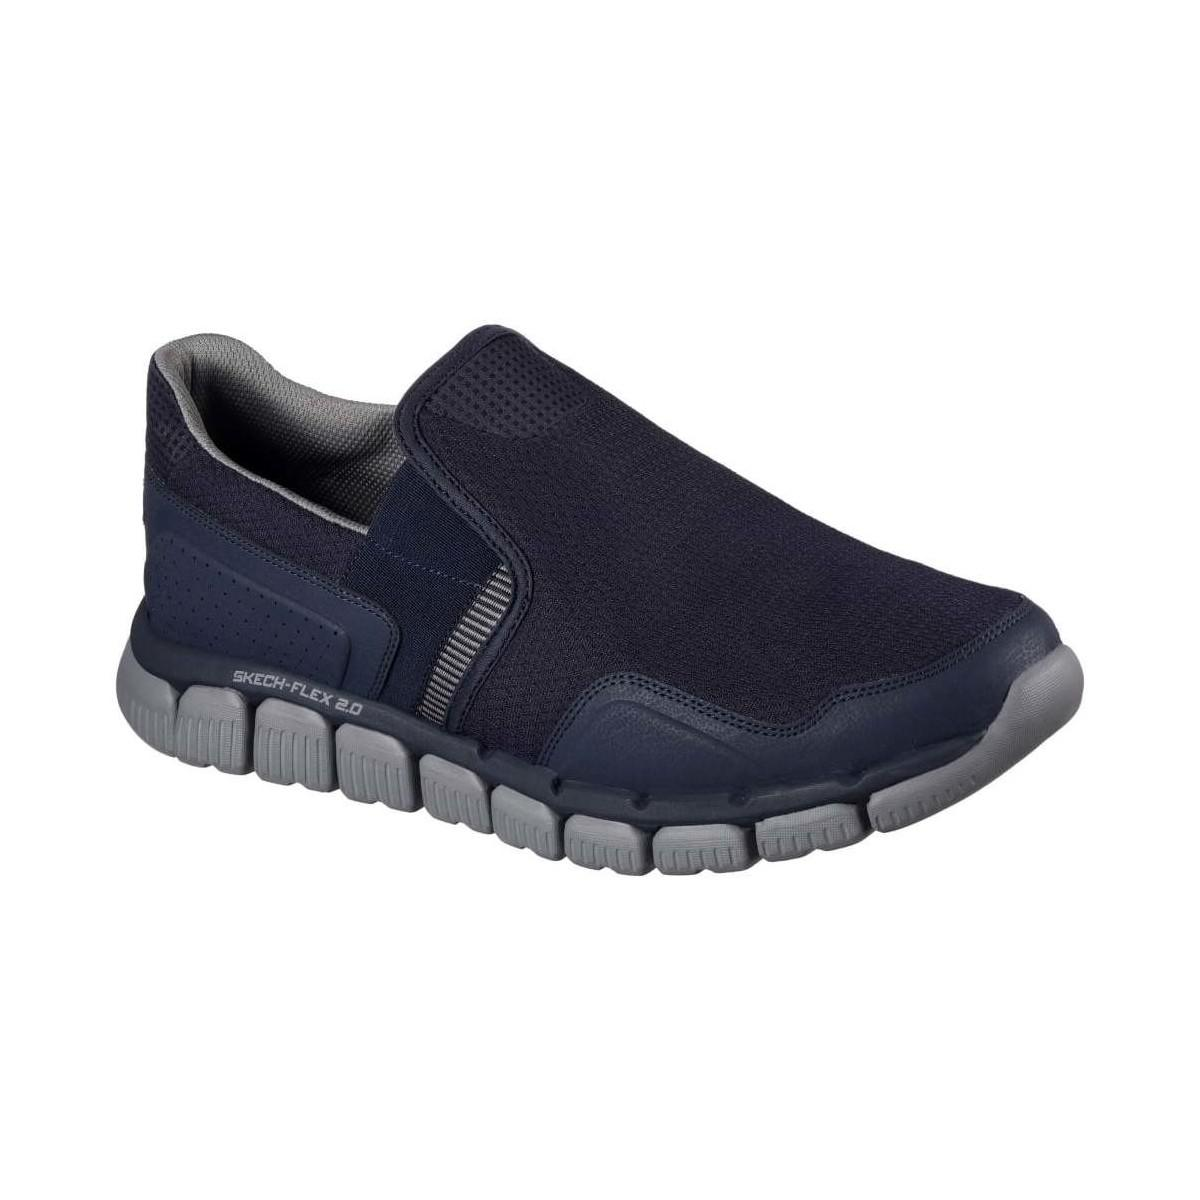 Skechers Skech Flex 2.0 Wentland Mens Slip On Sports Shoes in Navy/Grey (Blue) for Men